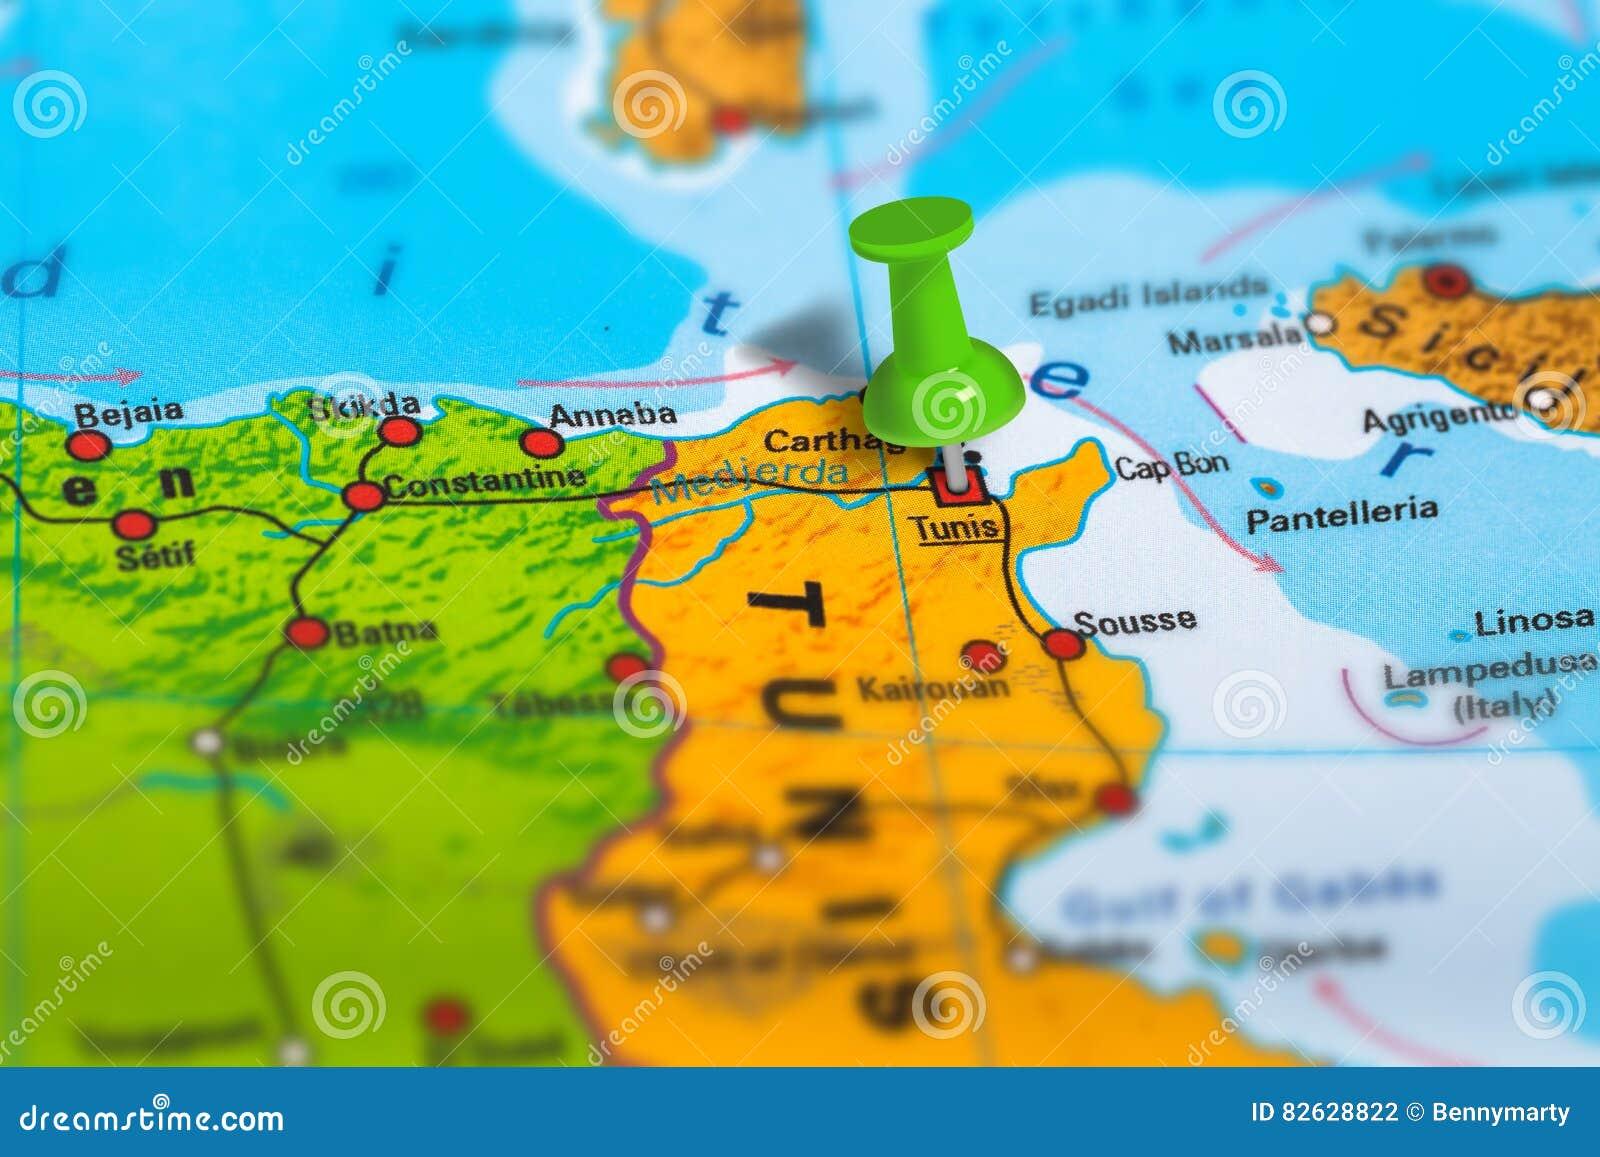 Picture of: Tunis Tunisia Map Stock Photo Image Of Landmark Culture 82628822